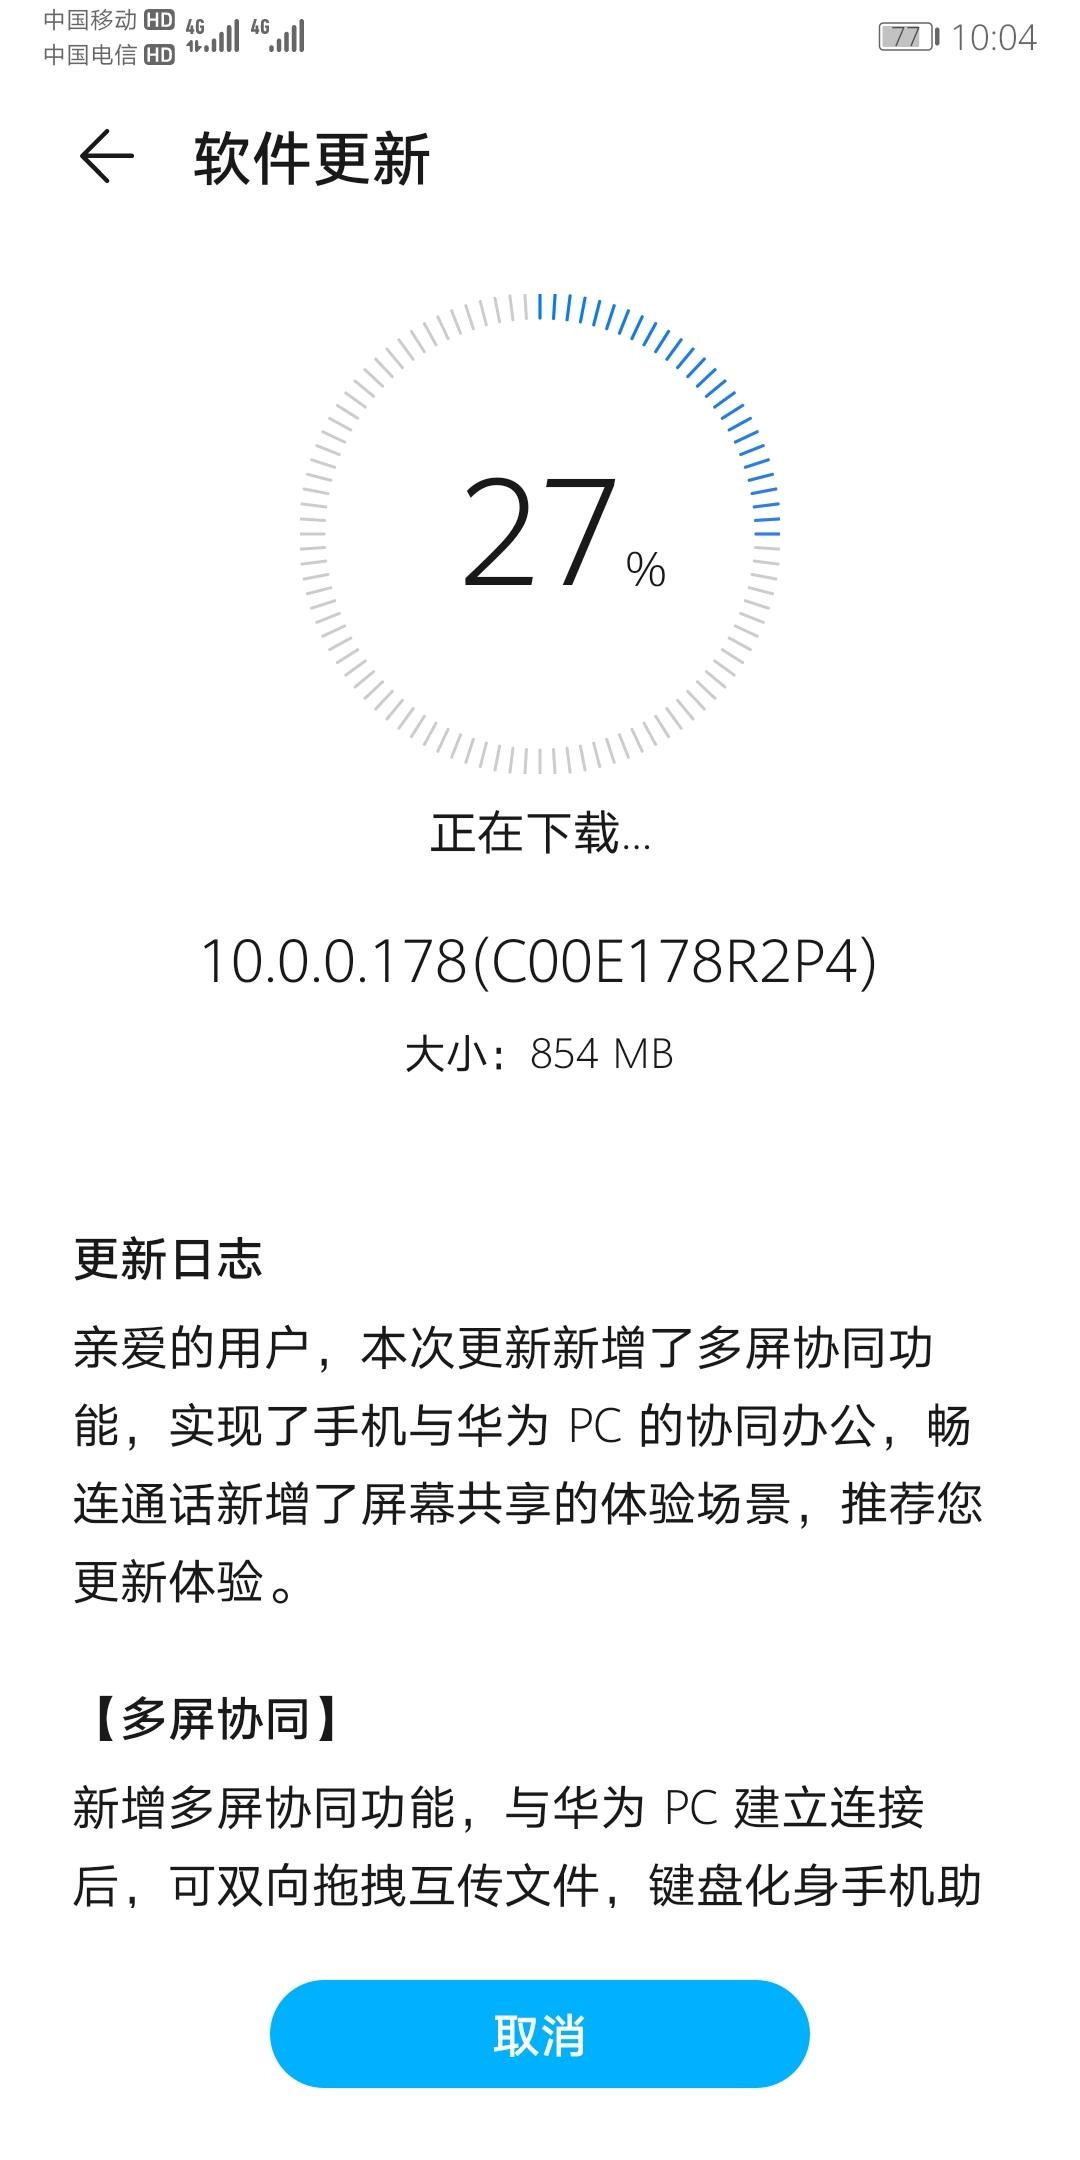 Screenshot_20200509_100449_com.huawei.android.hwouc.jpg